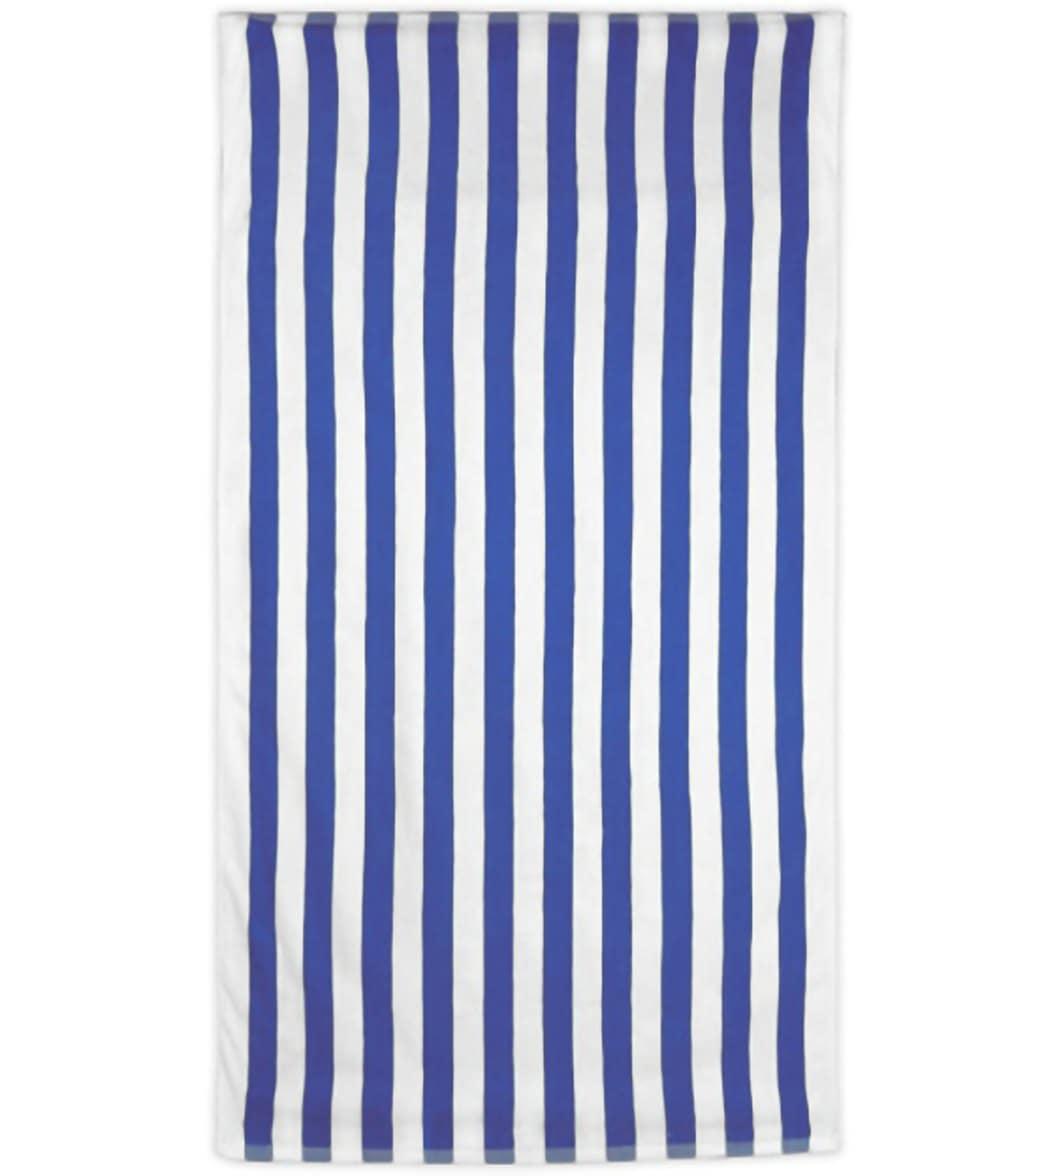 Resort Striped Beach Towel